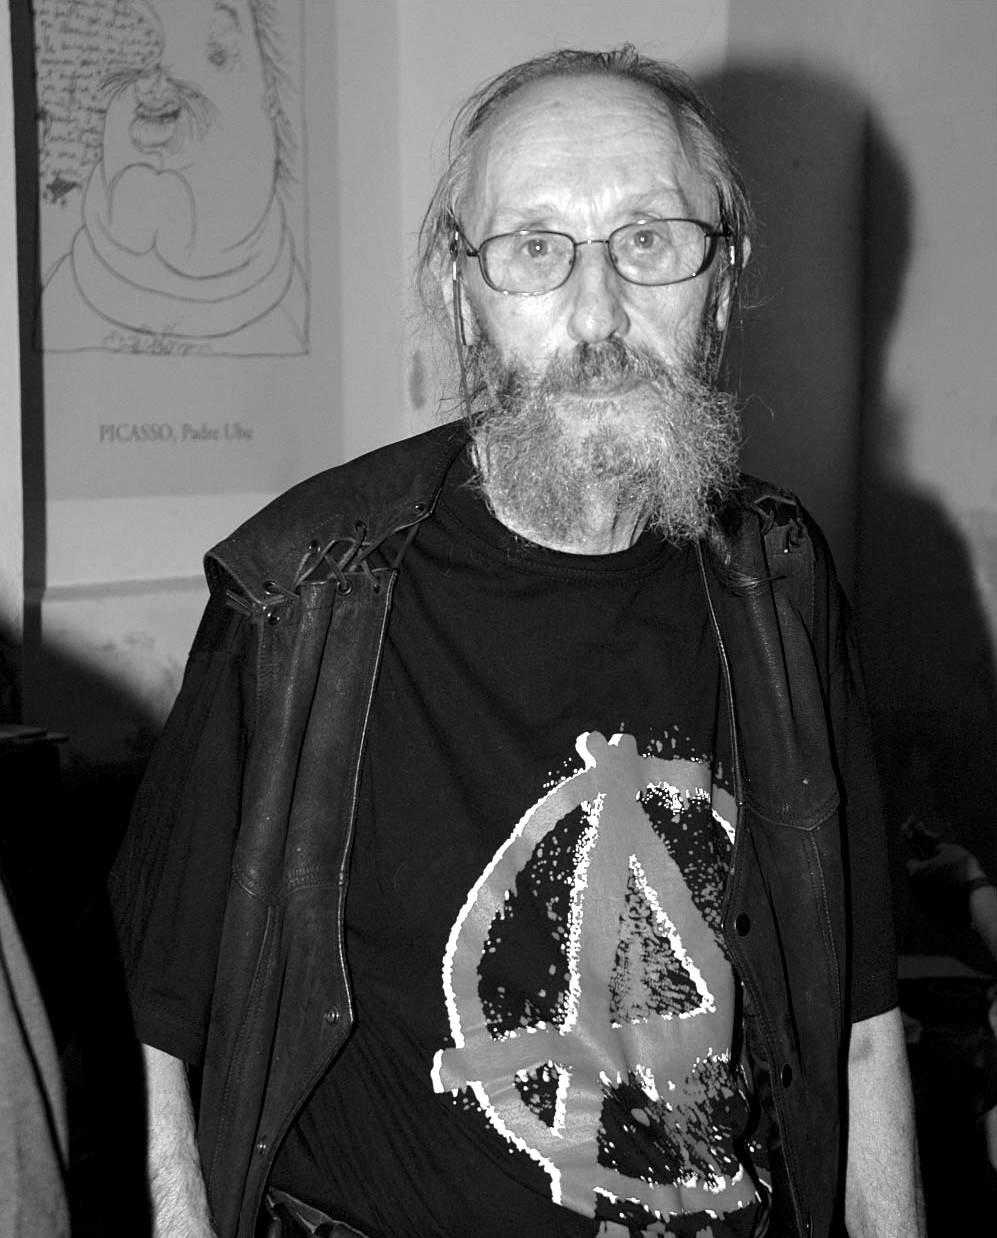 Umberto Montefameglio